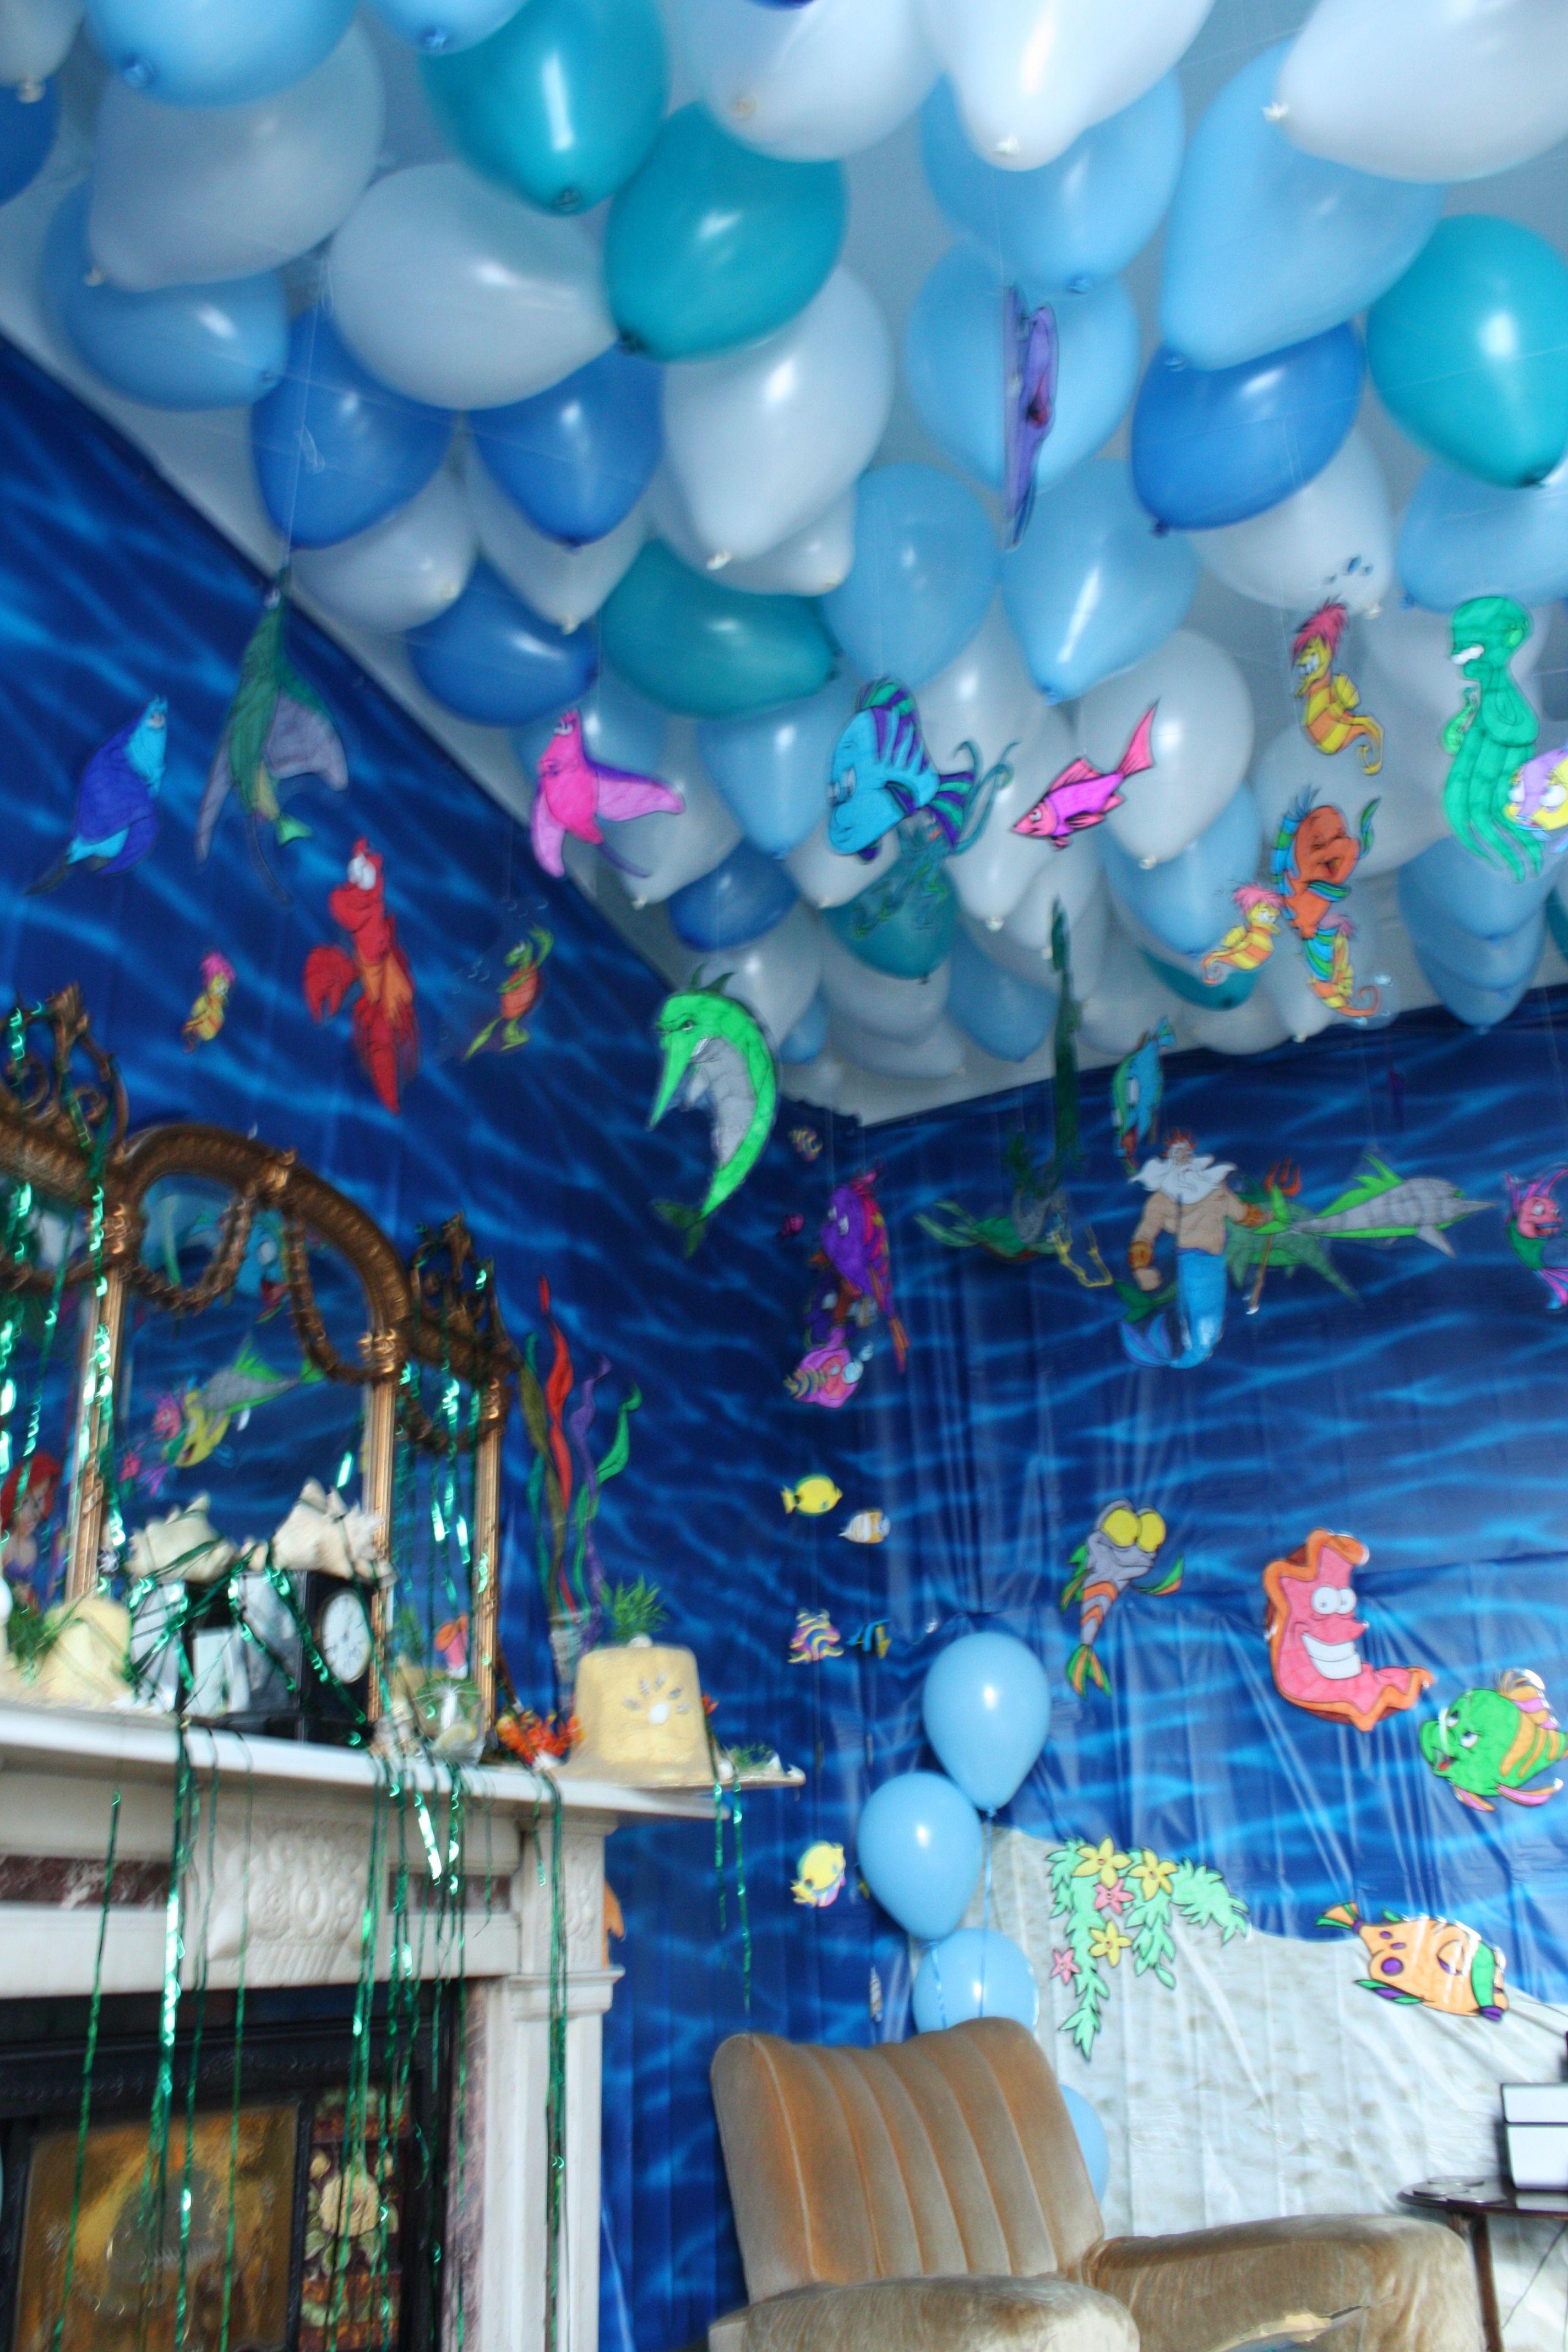 Little Mermaid Party Decoration Ideas  Baking meets Disney A Little Mermaid Hen Do